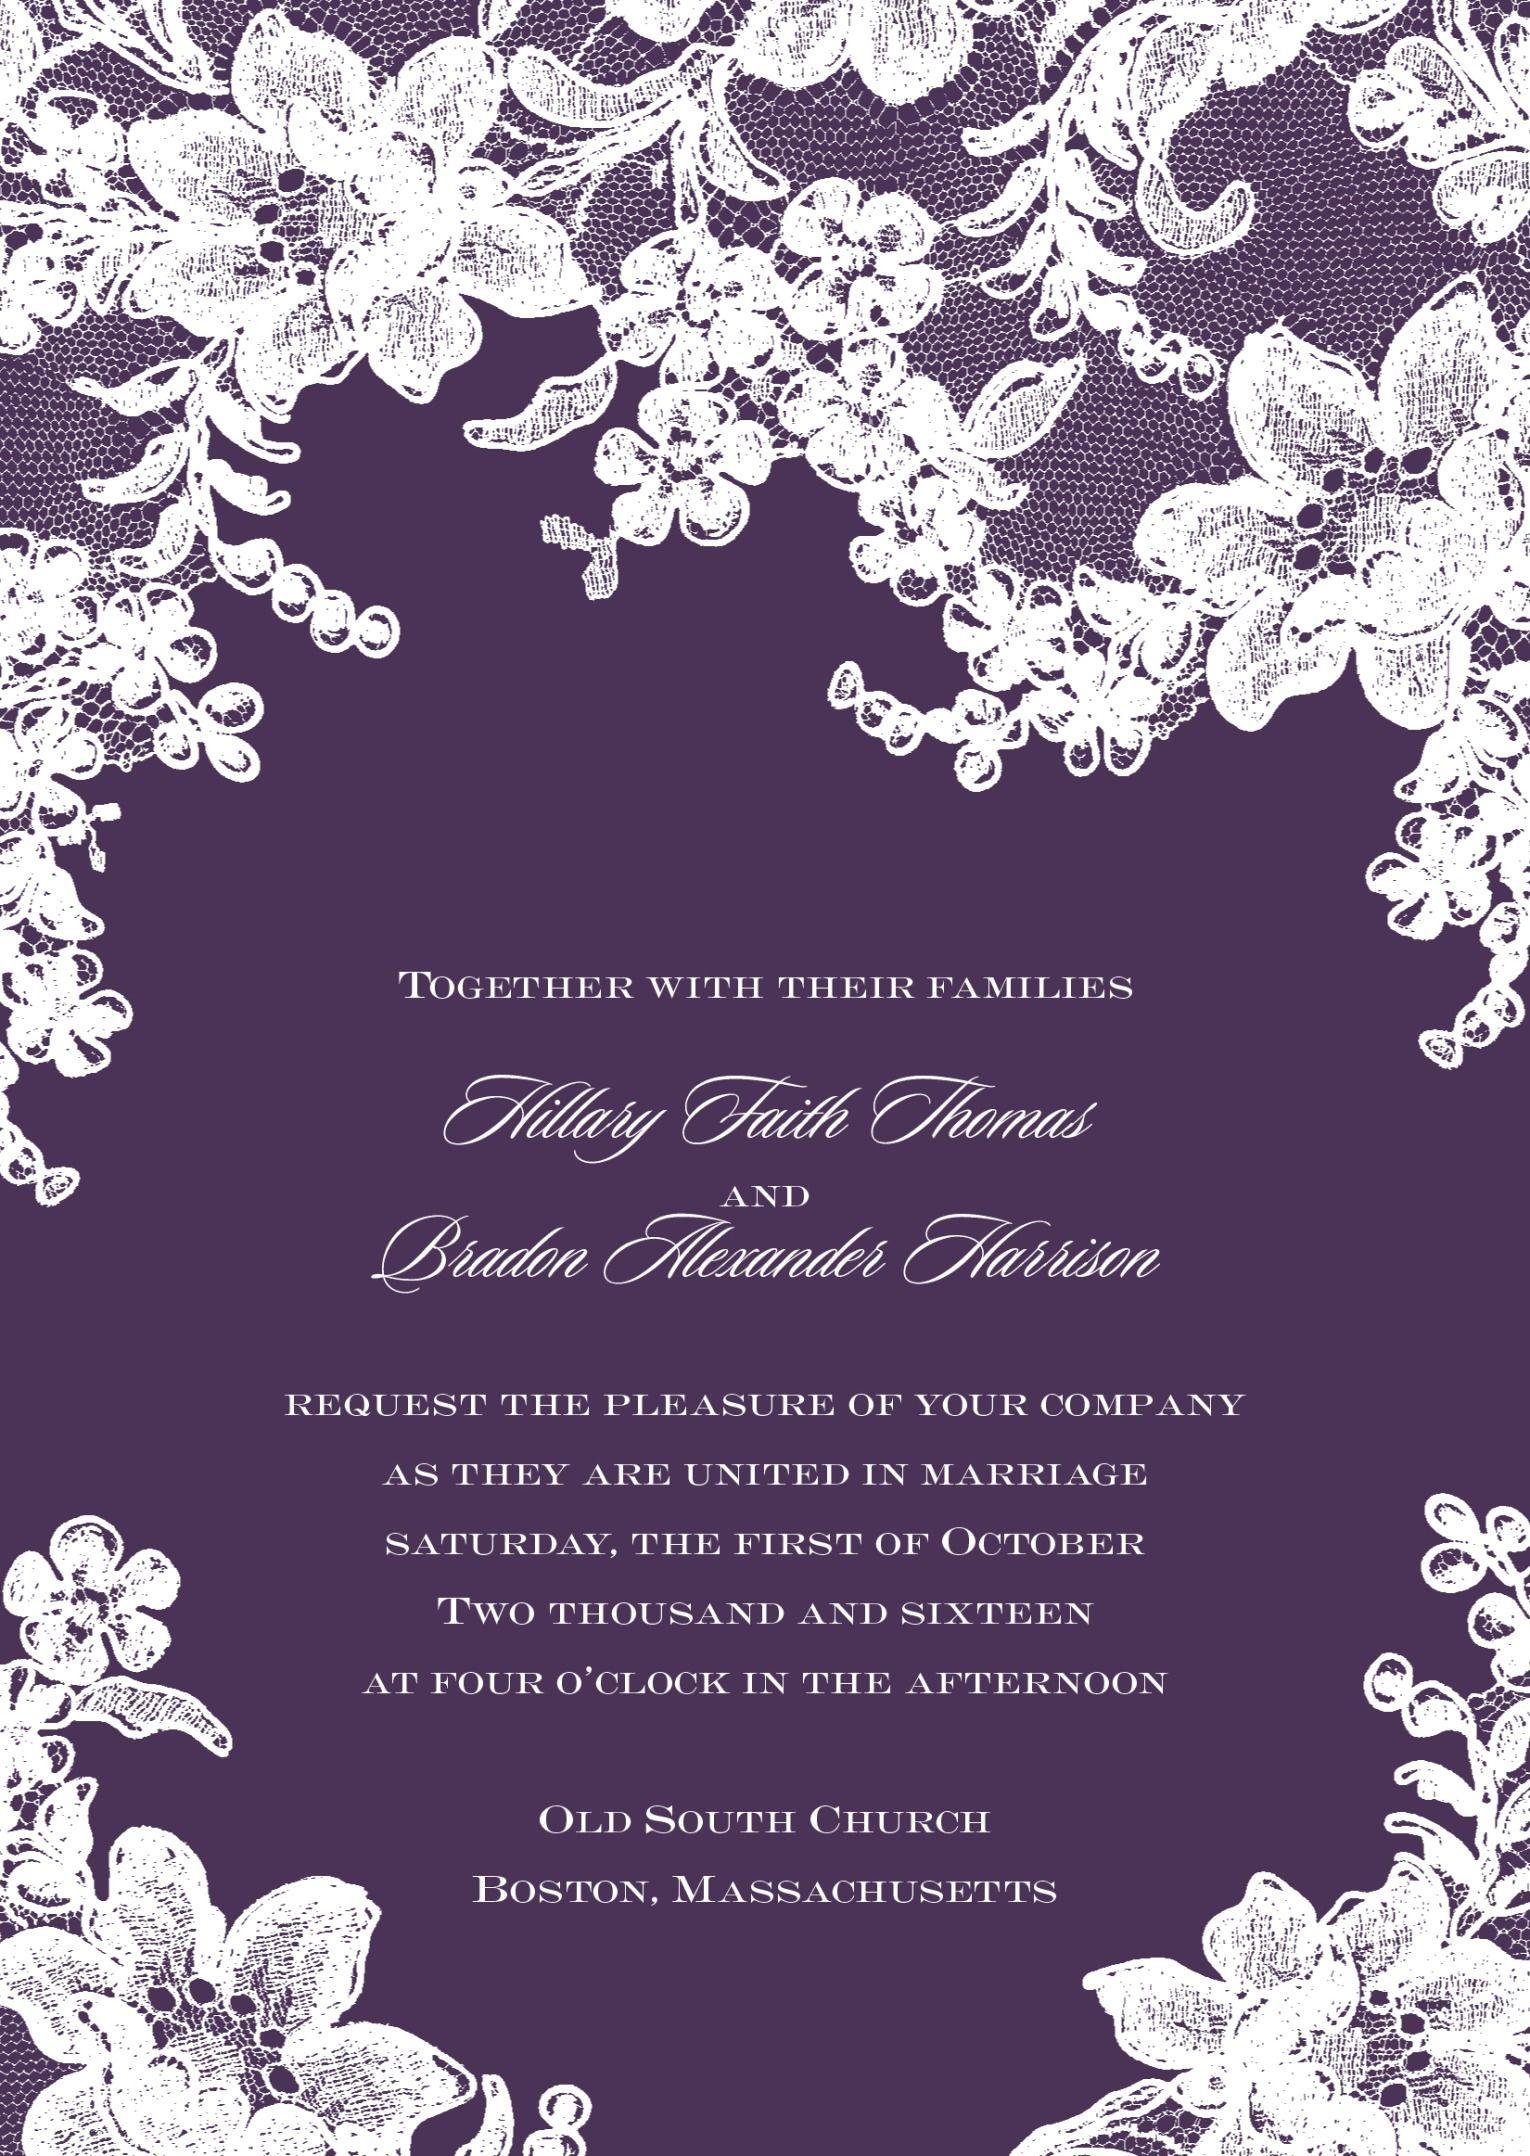 Floral Lace Wedding Invitation Lace Wedding Invitations Wedding Invitations Classic Wedding Invitations